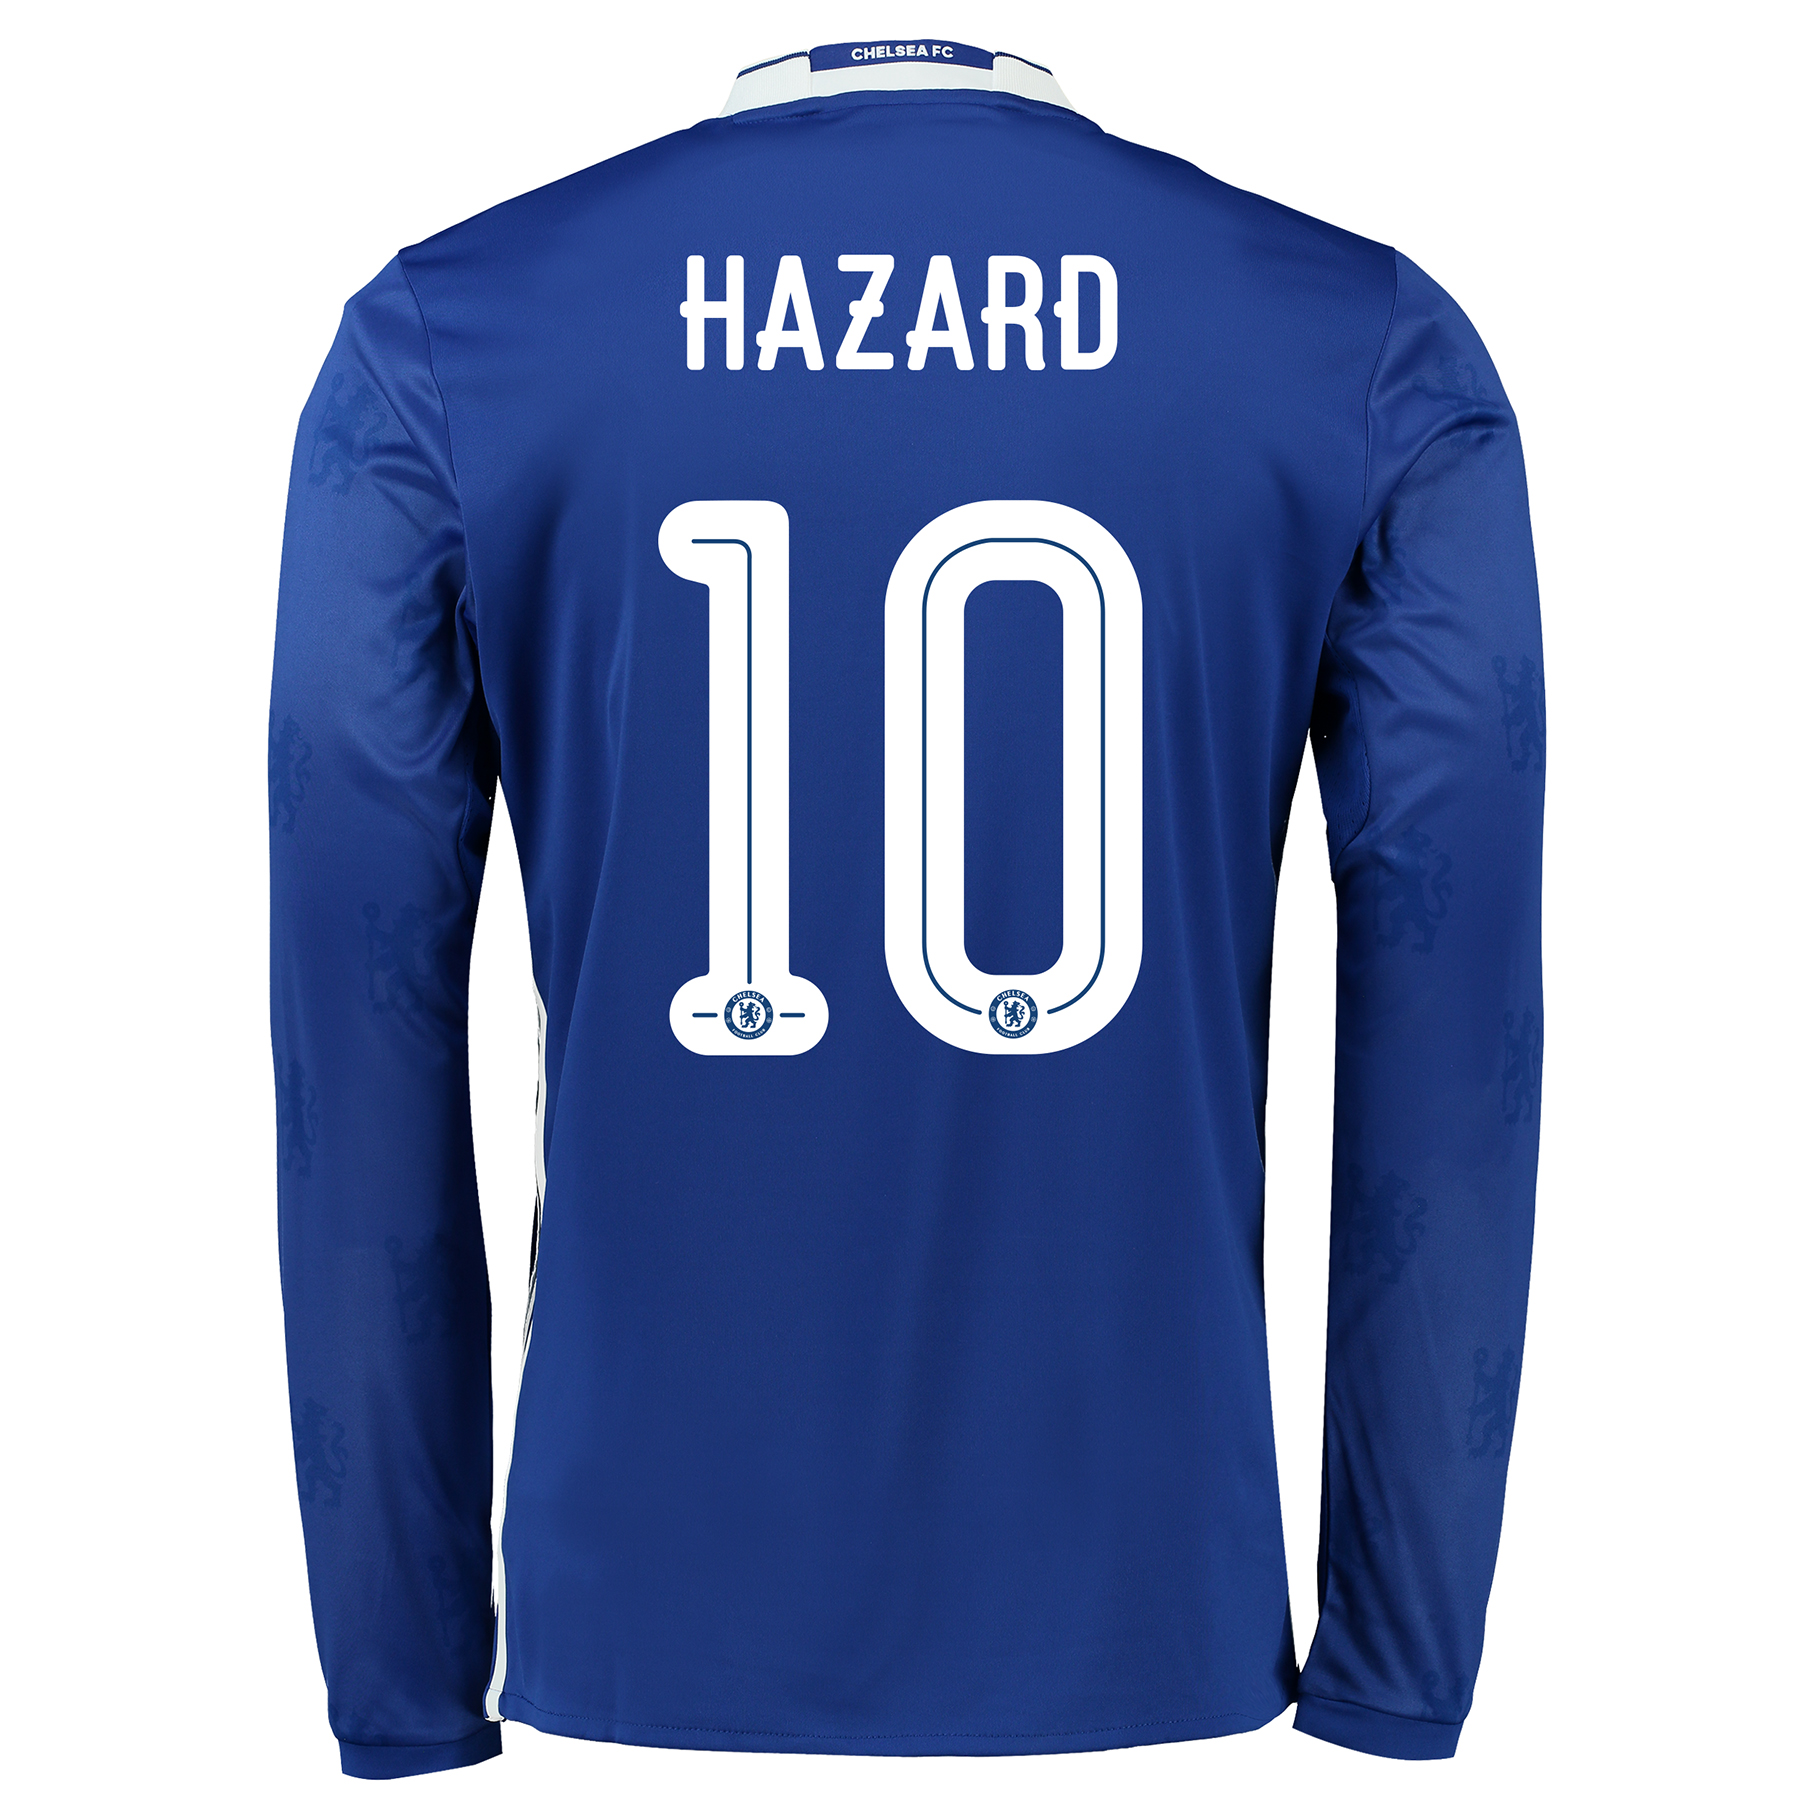 Chelsea Linear Home Shirt 2016-17 - Kids - Long Sleeve with Hazard 10